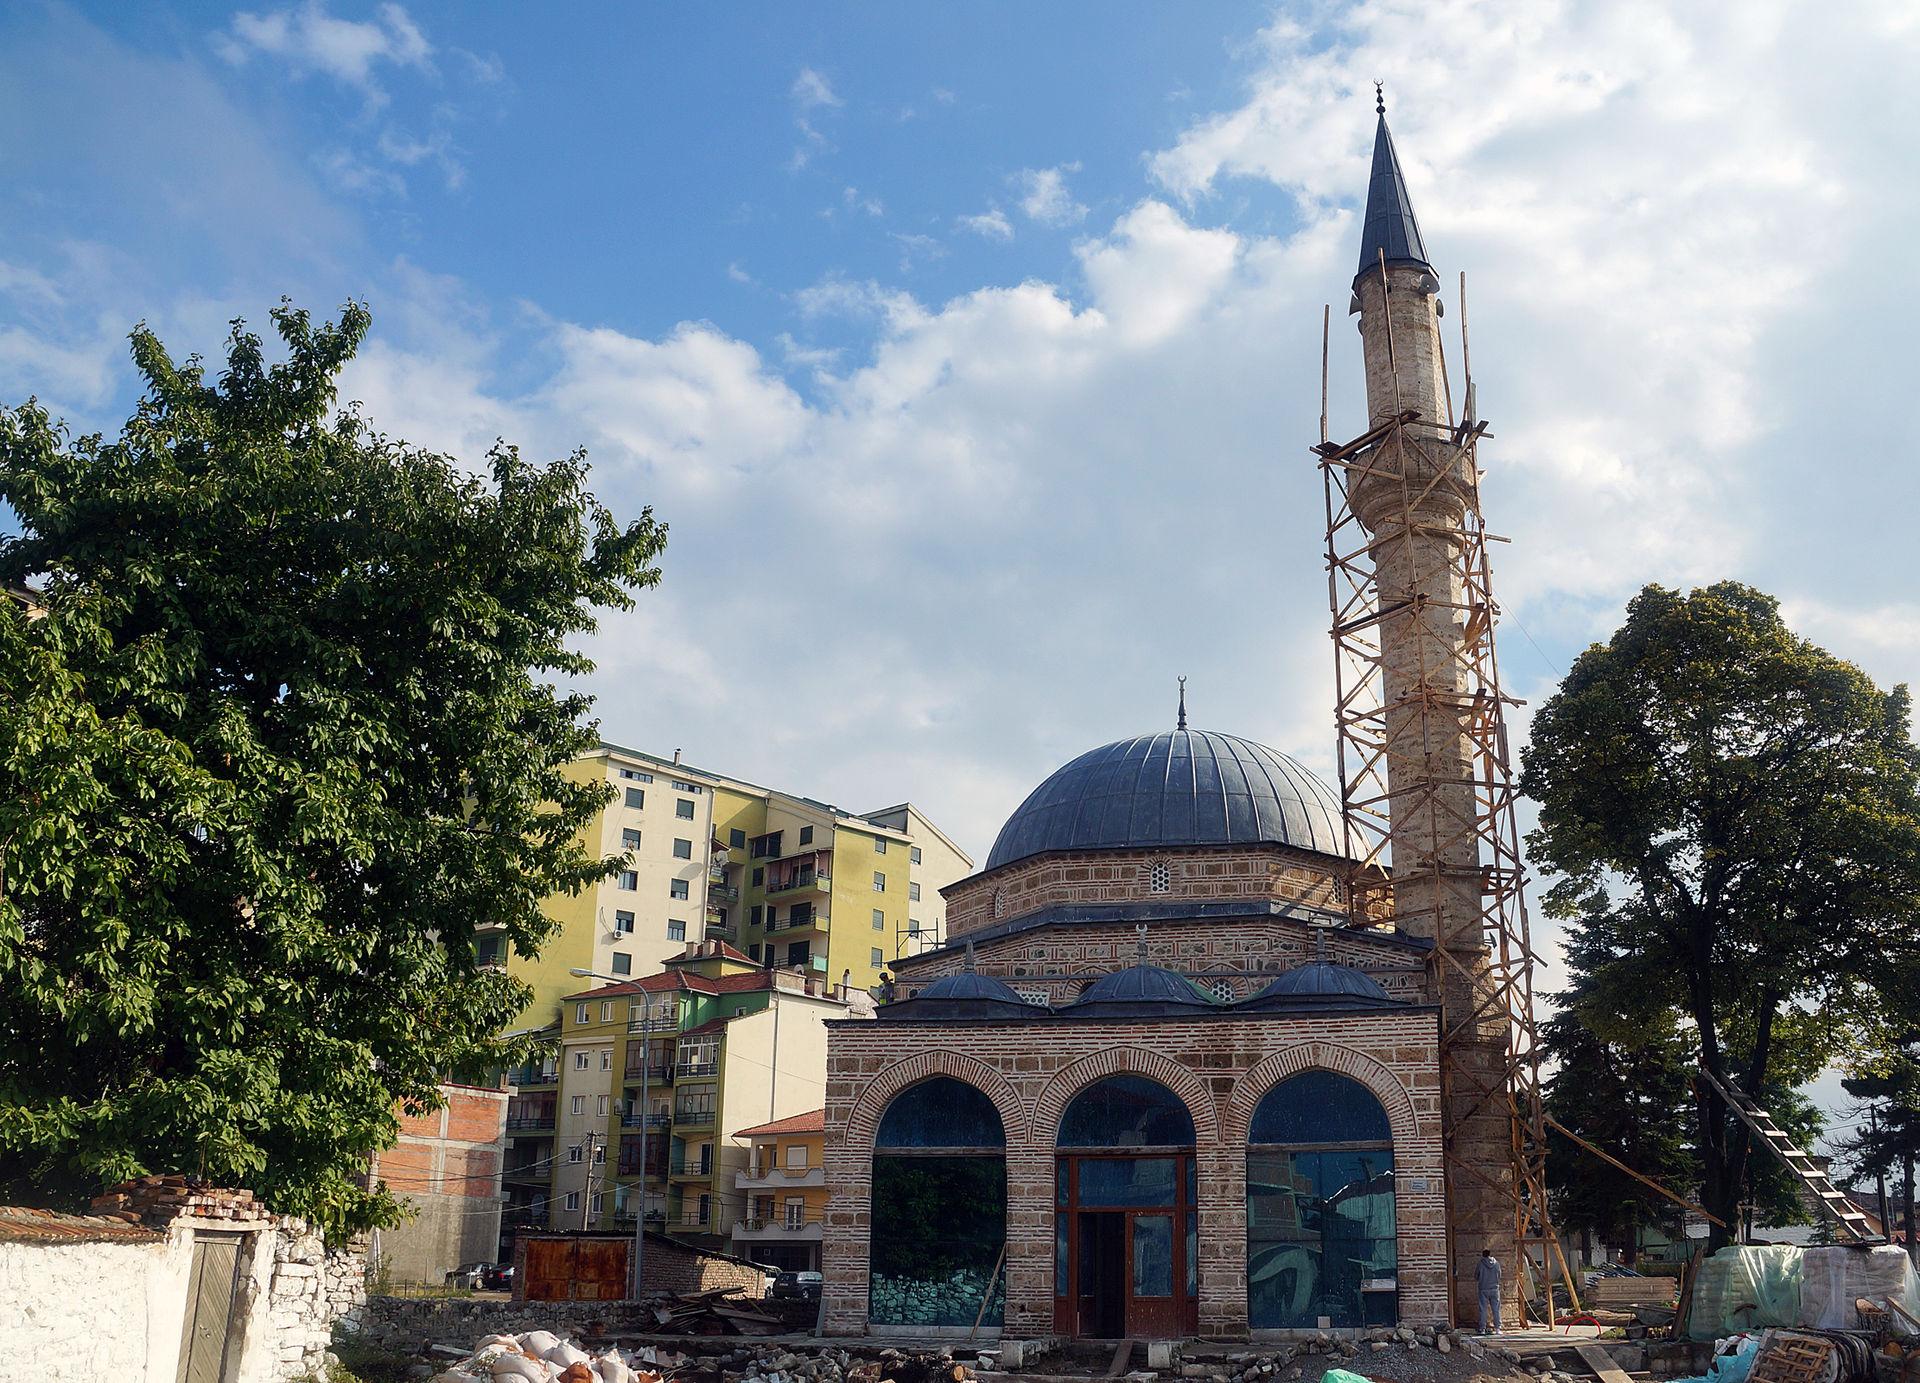 Mosque Wikipedia: Mirahori Mosque, Korçë